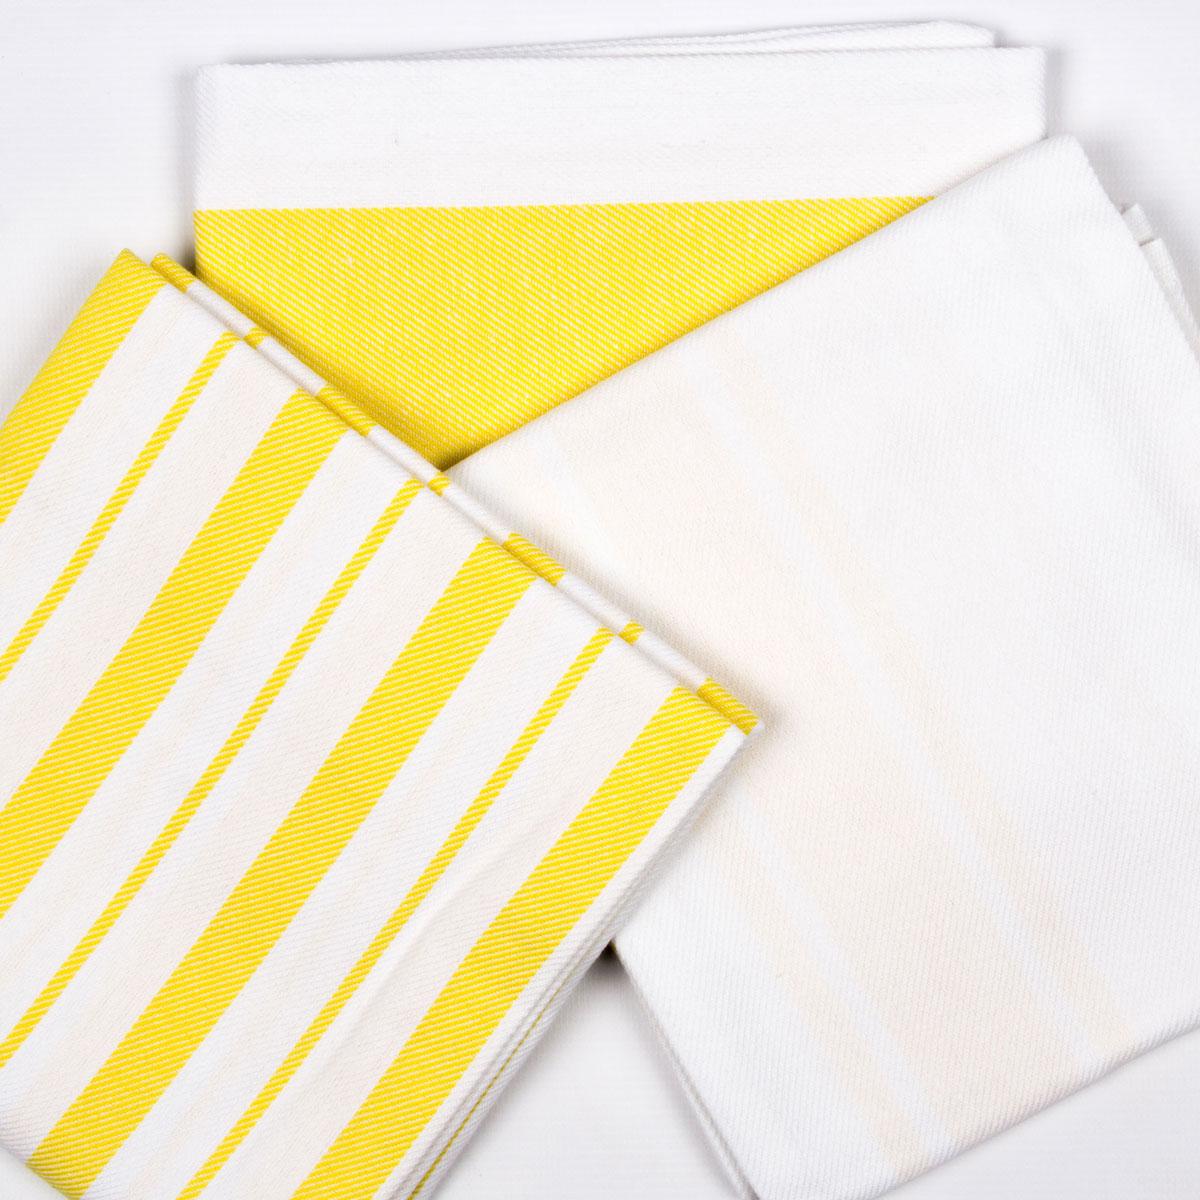 Купить Полотенца Arya, Кухонное полотенце Gabi Цвет: Желтый (50х70 см), Турция, Белый, Желтый, Бязь